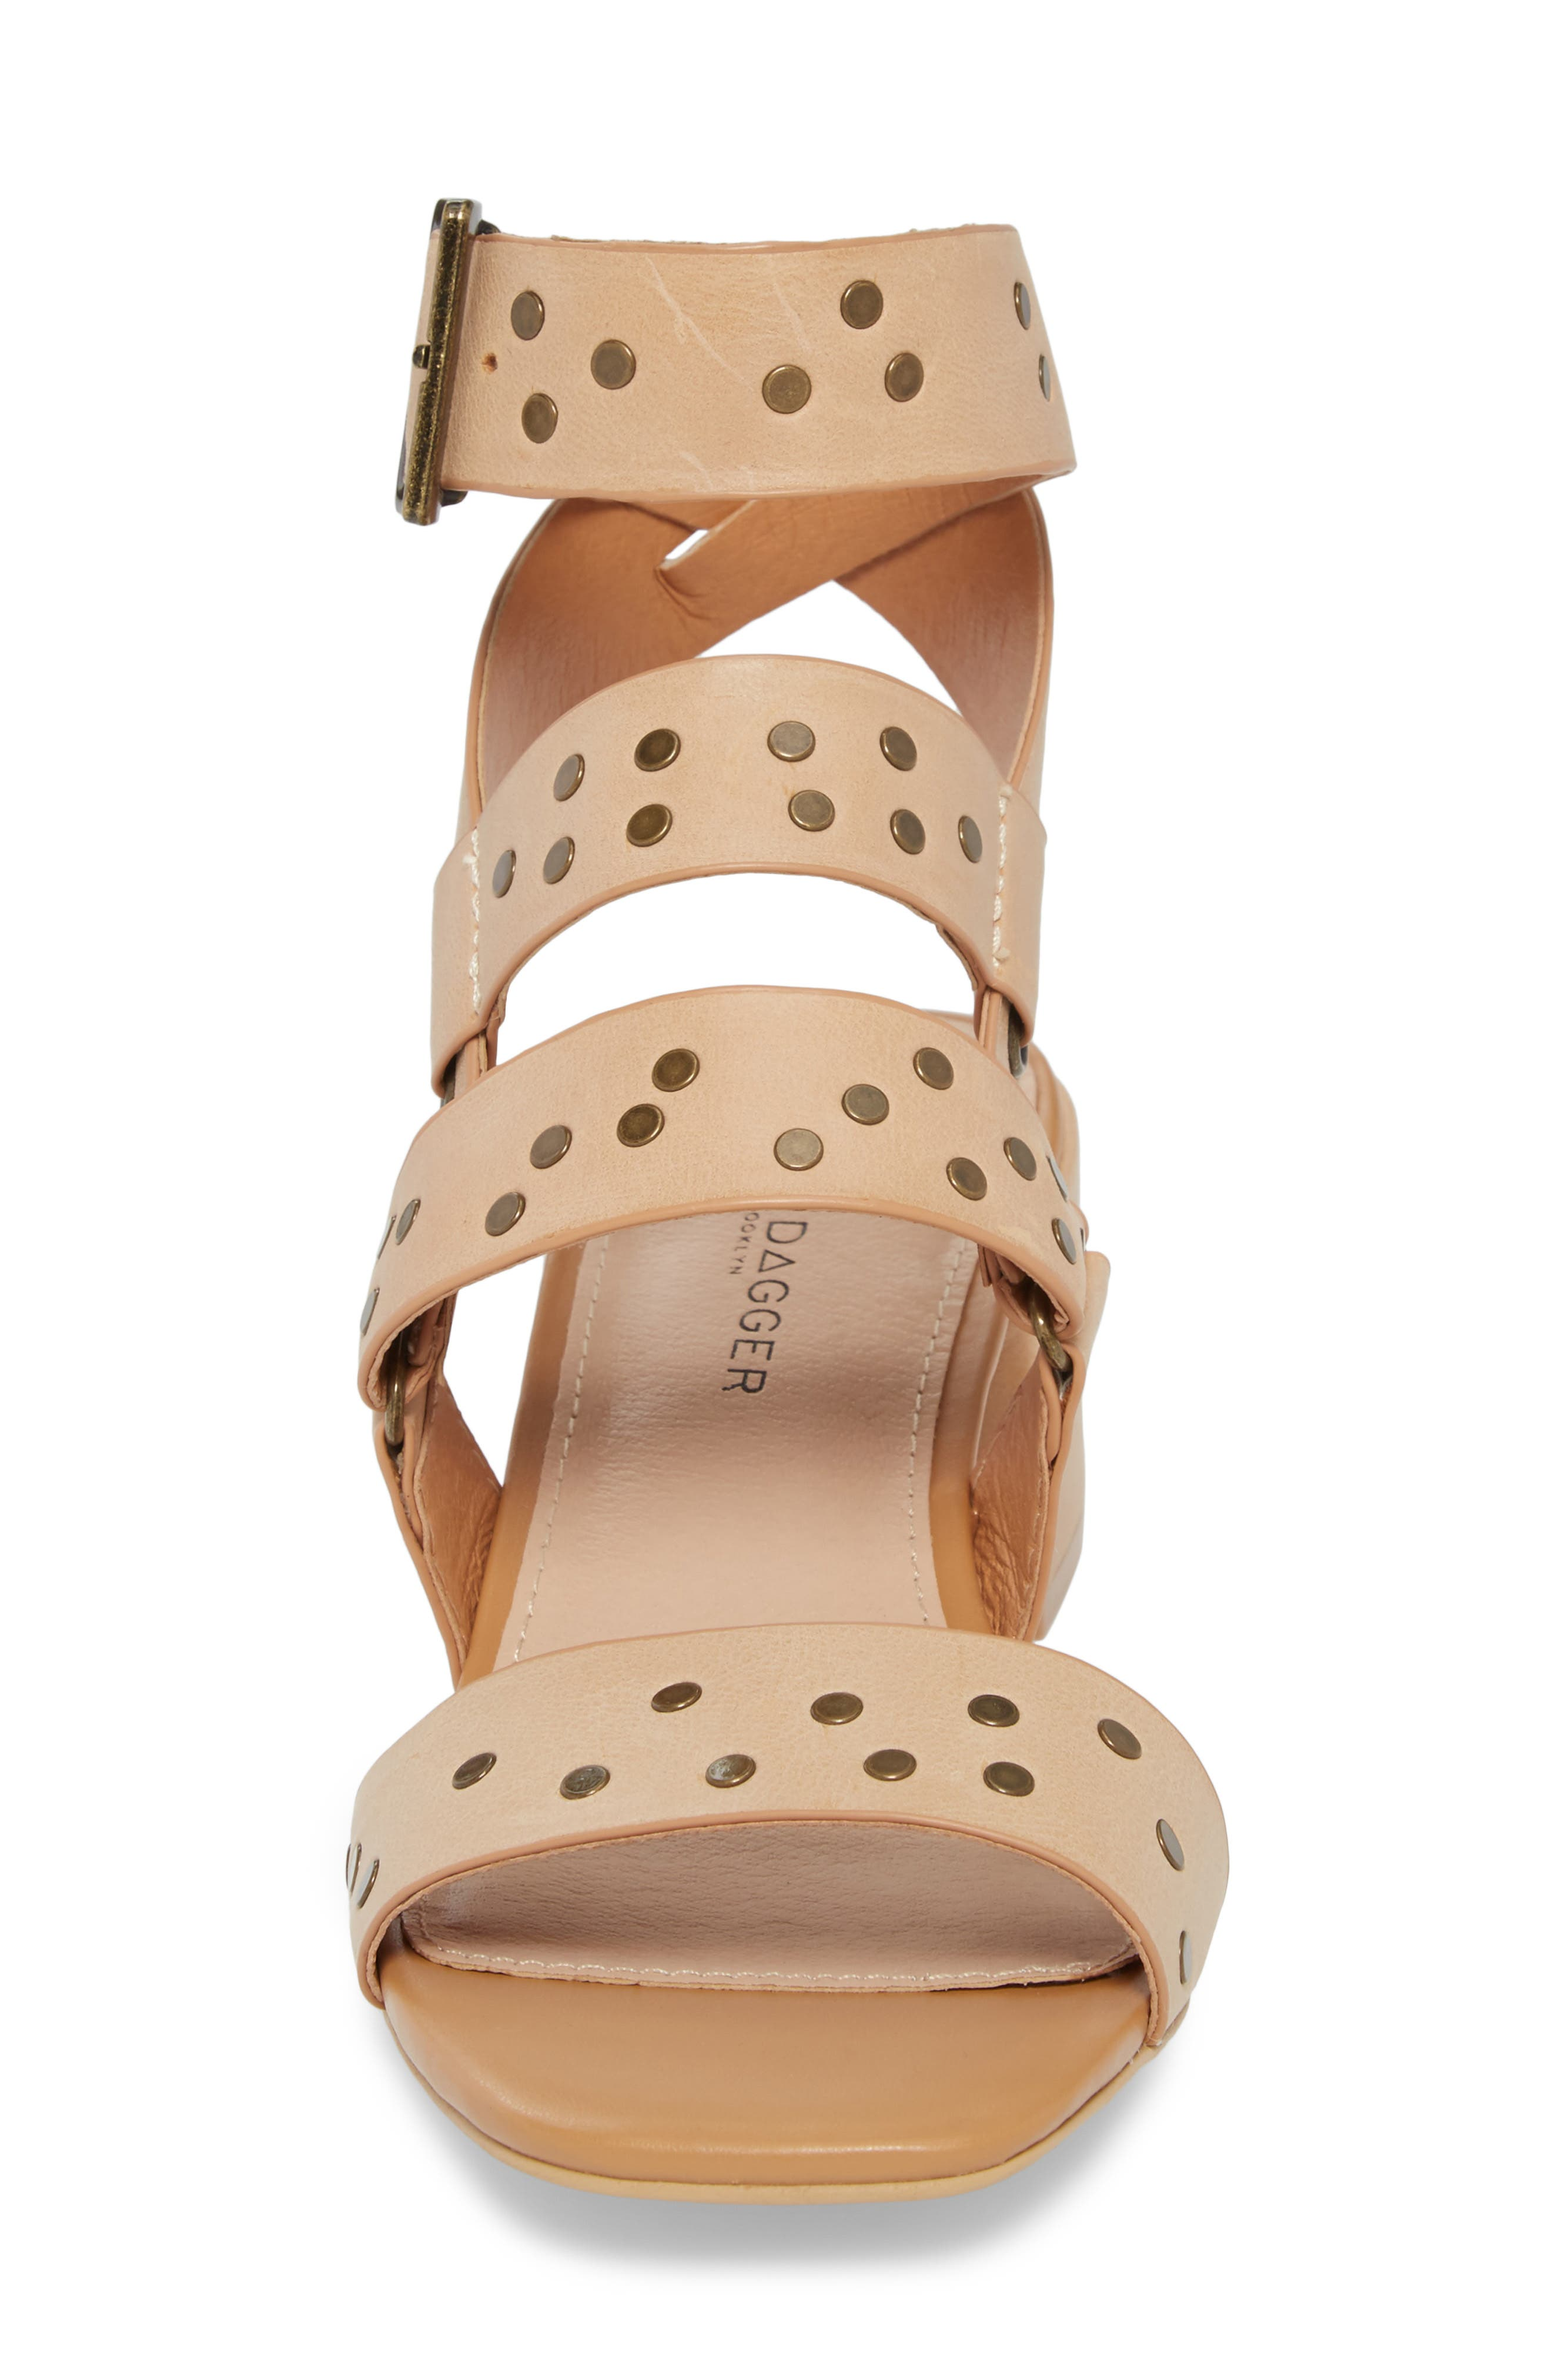 Seabring City Sandal,                             Alternate thumbnail 4, color,                             Tan Leather